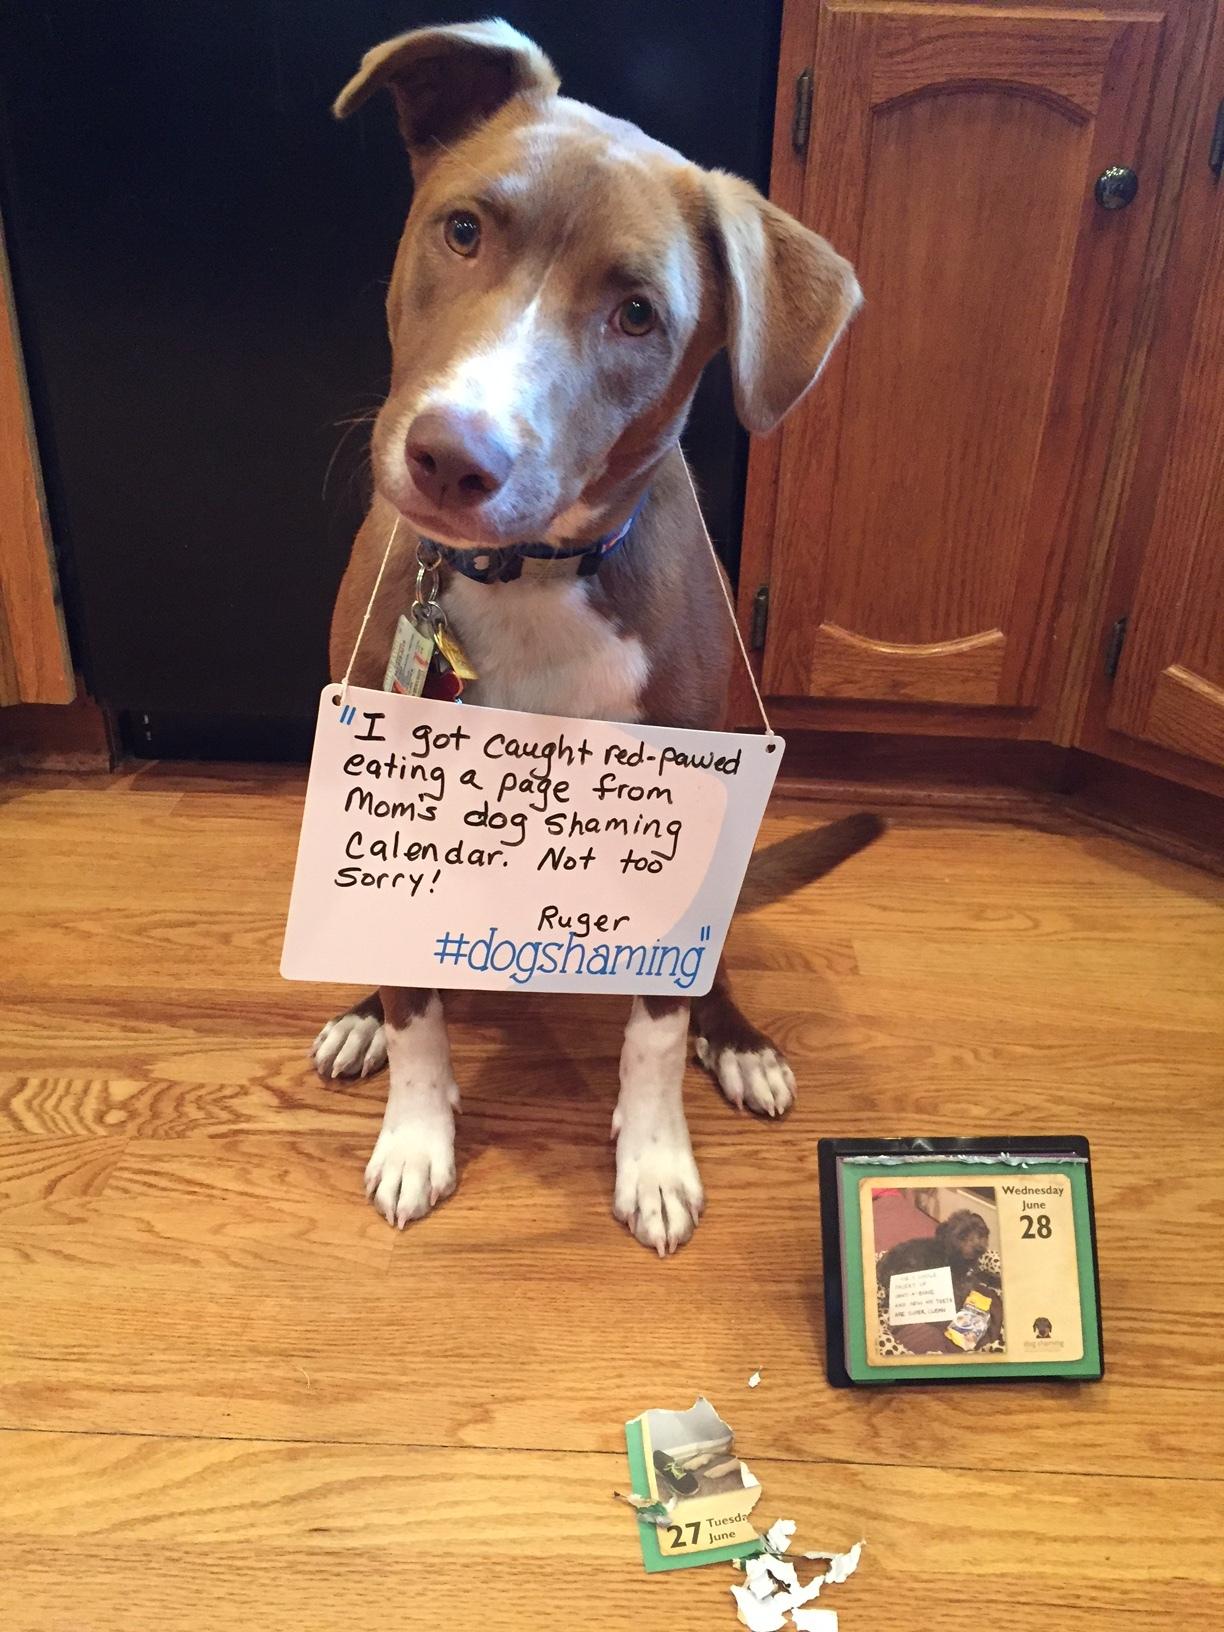 ruger dog shaming 6 28 17 chewed up dog shaming calendar 1 flipped jpg